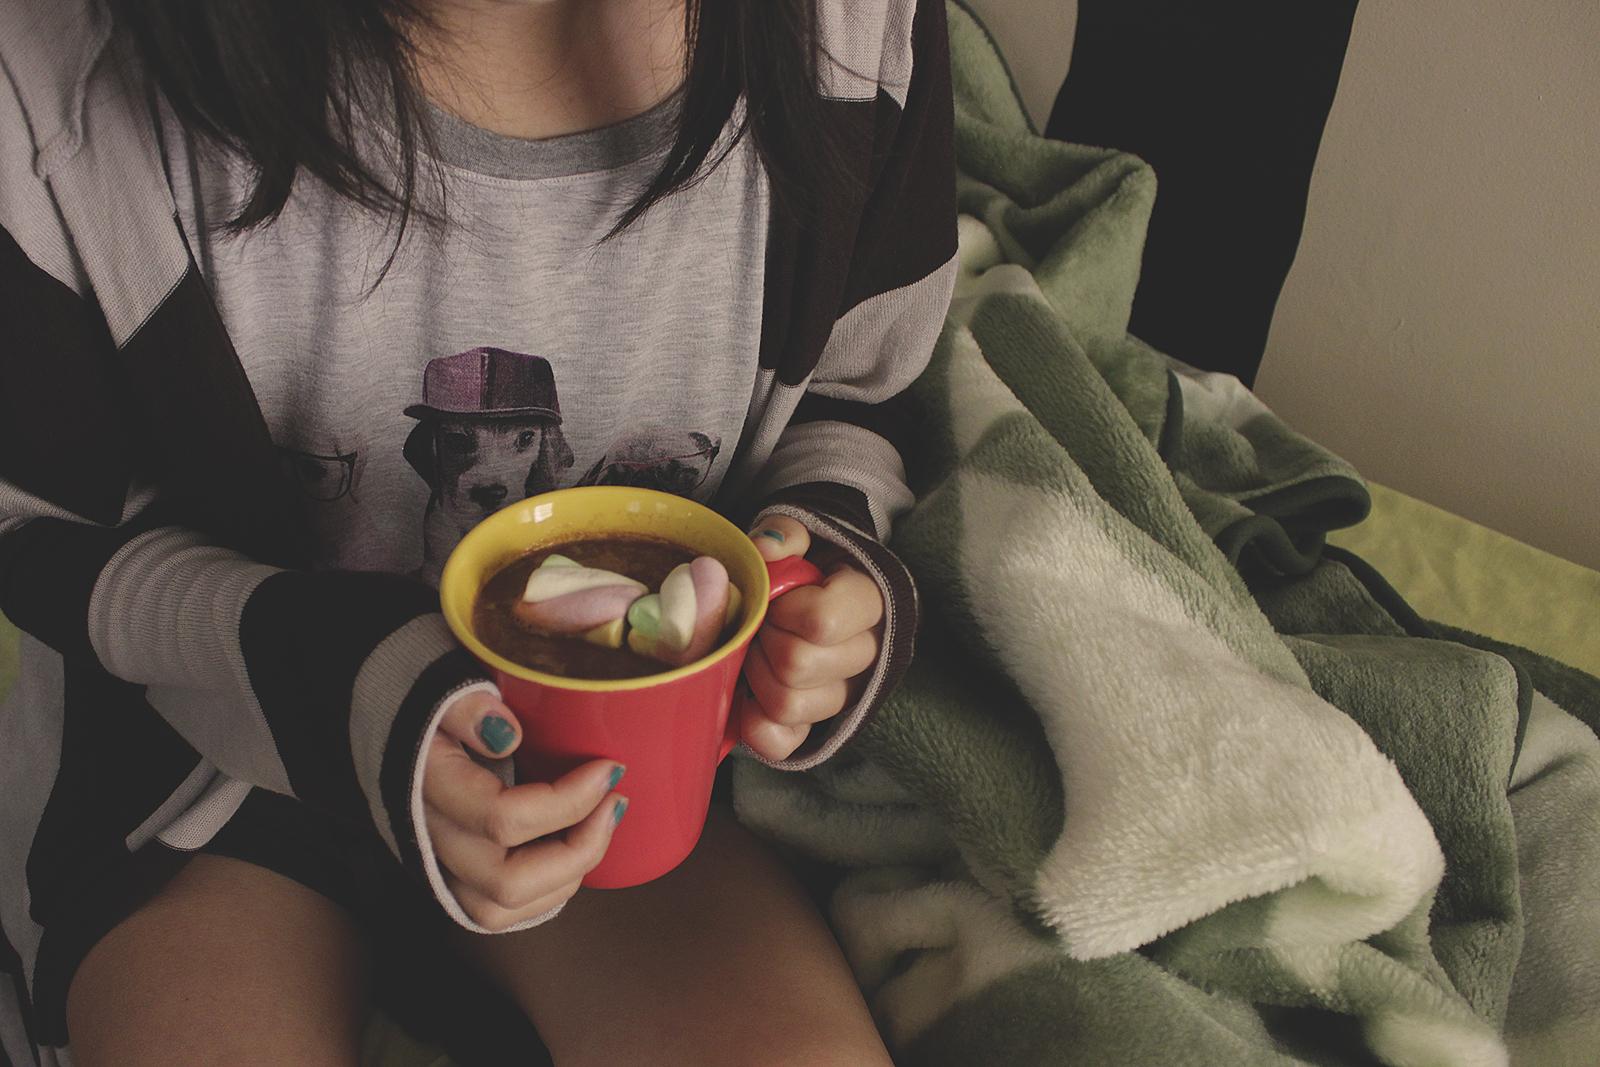 bebida quente no frio